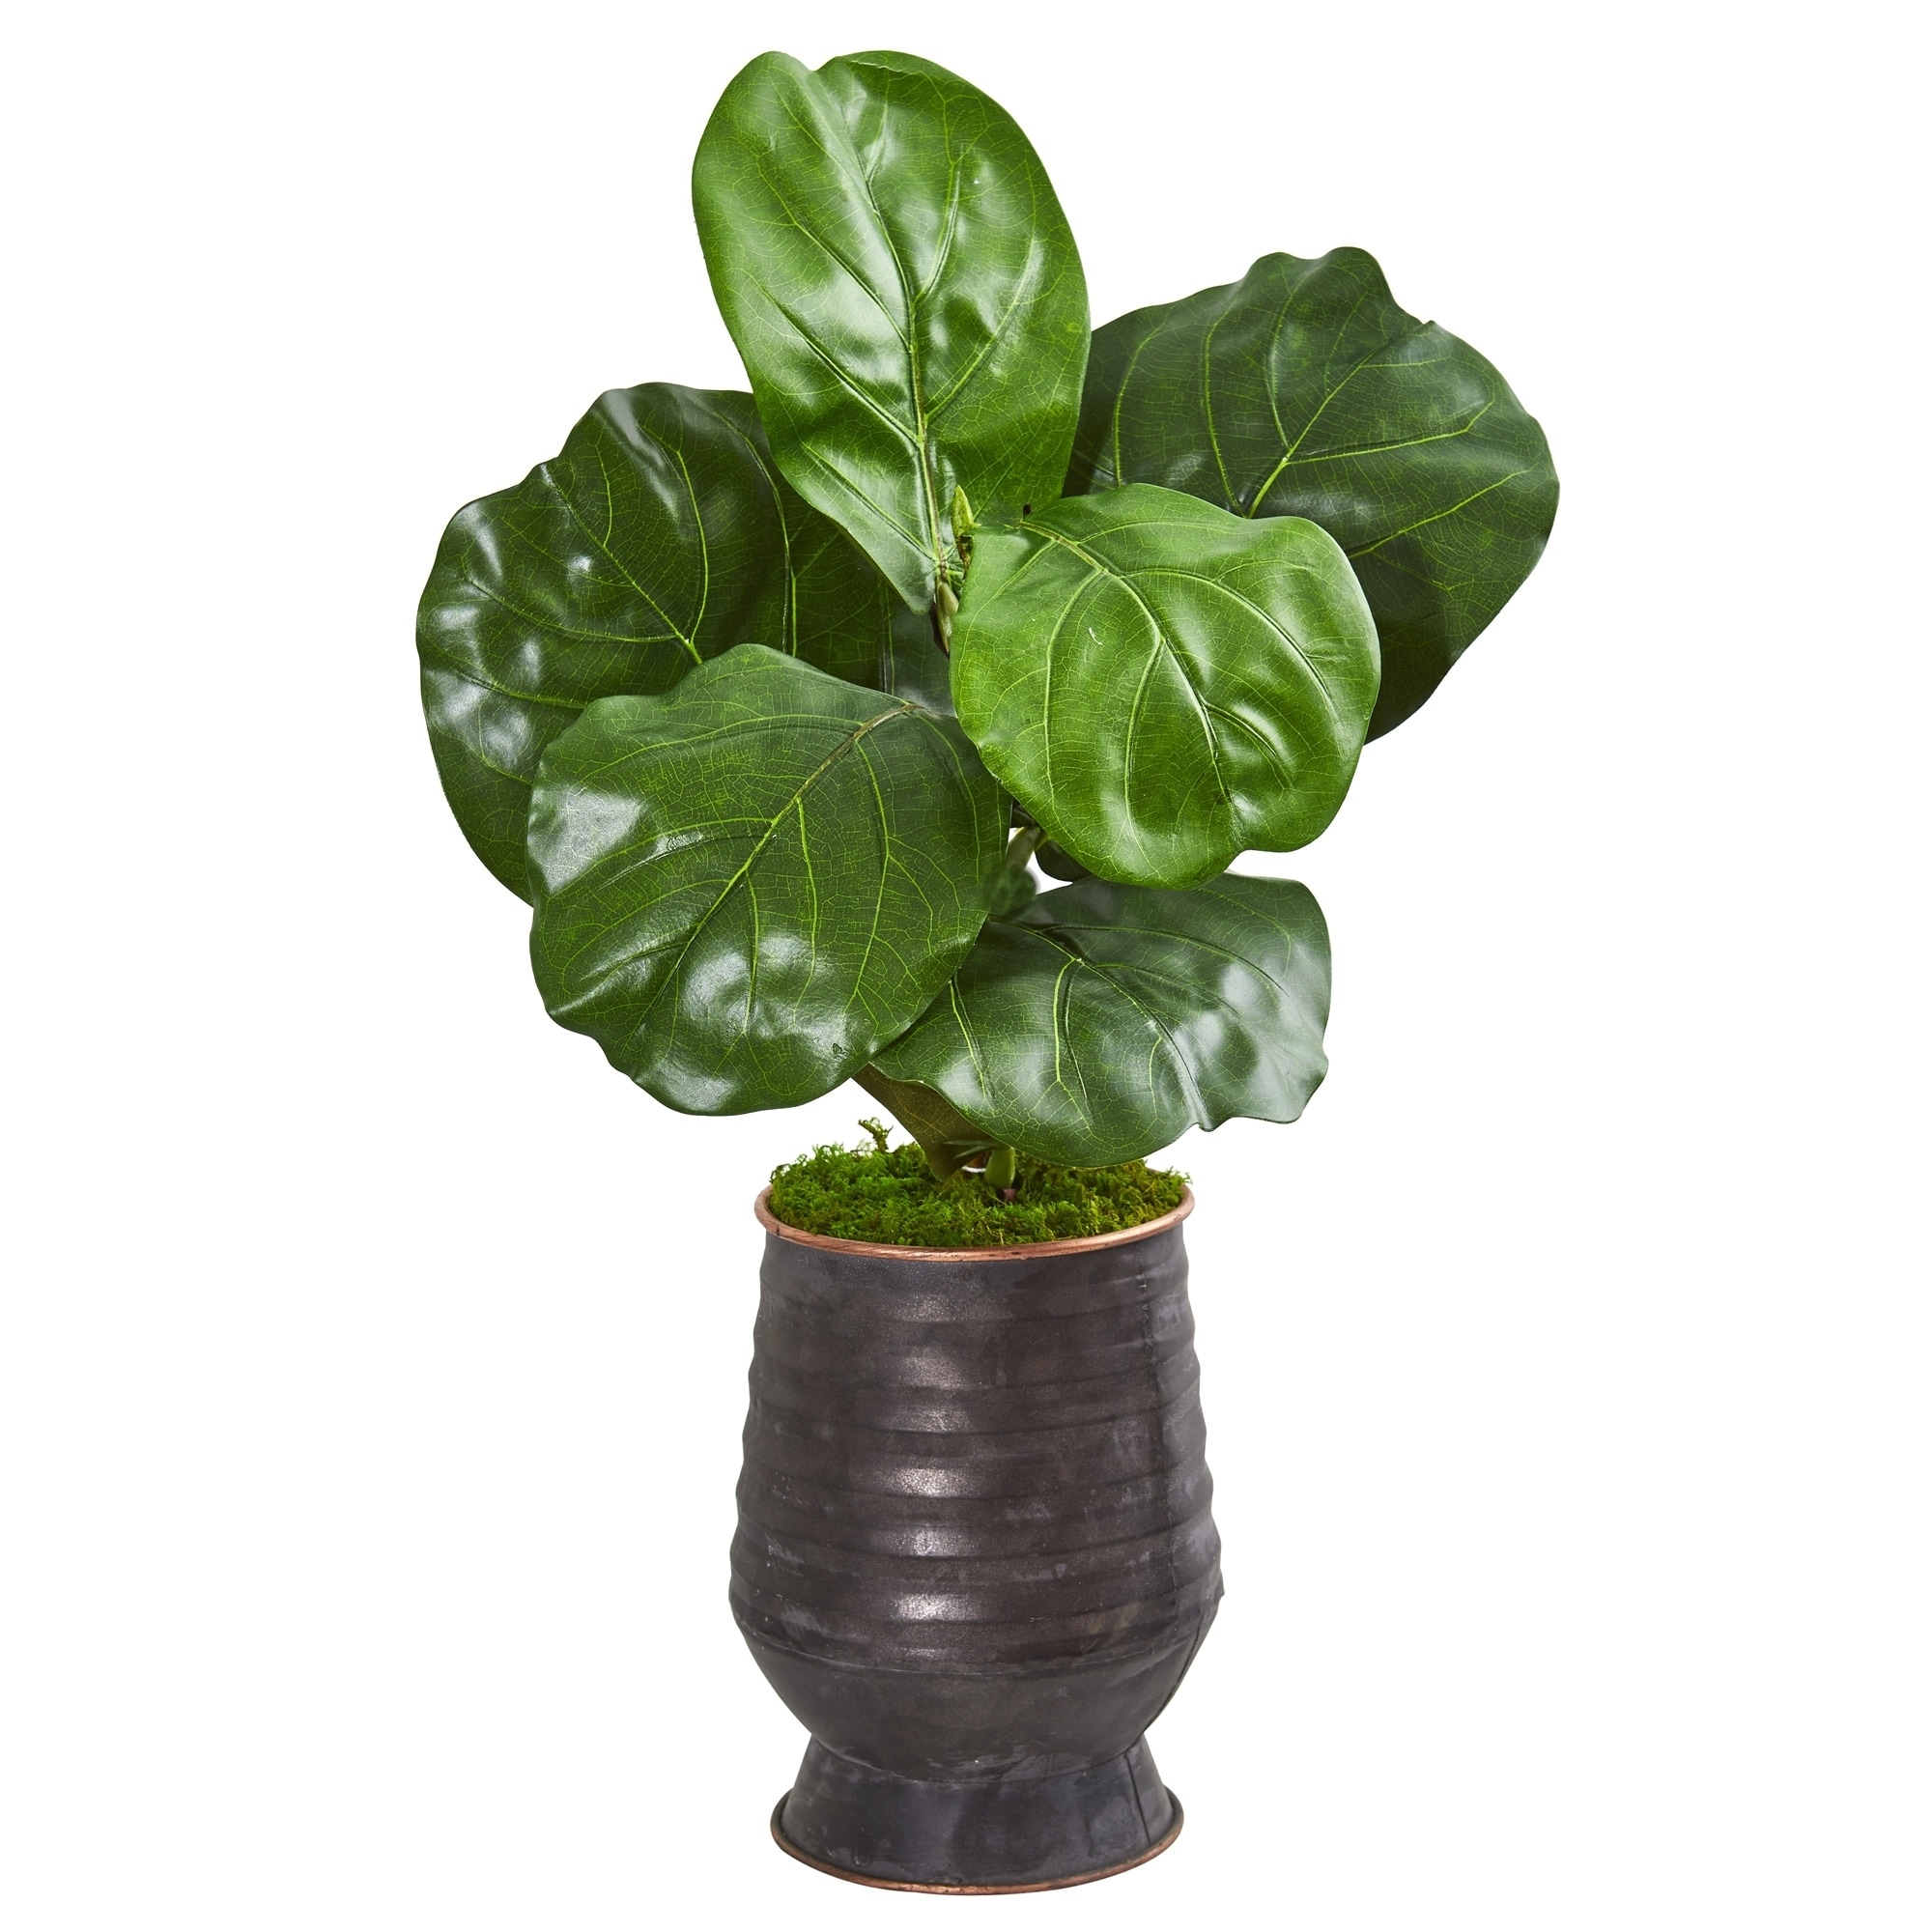 24 Fiddle Leaf Artificial Plant in Decorative Planter